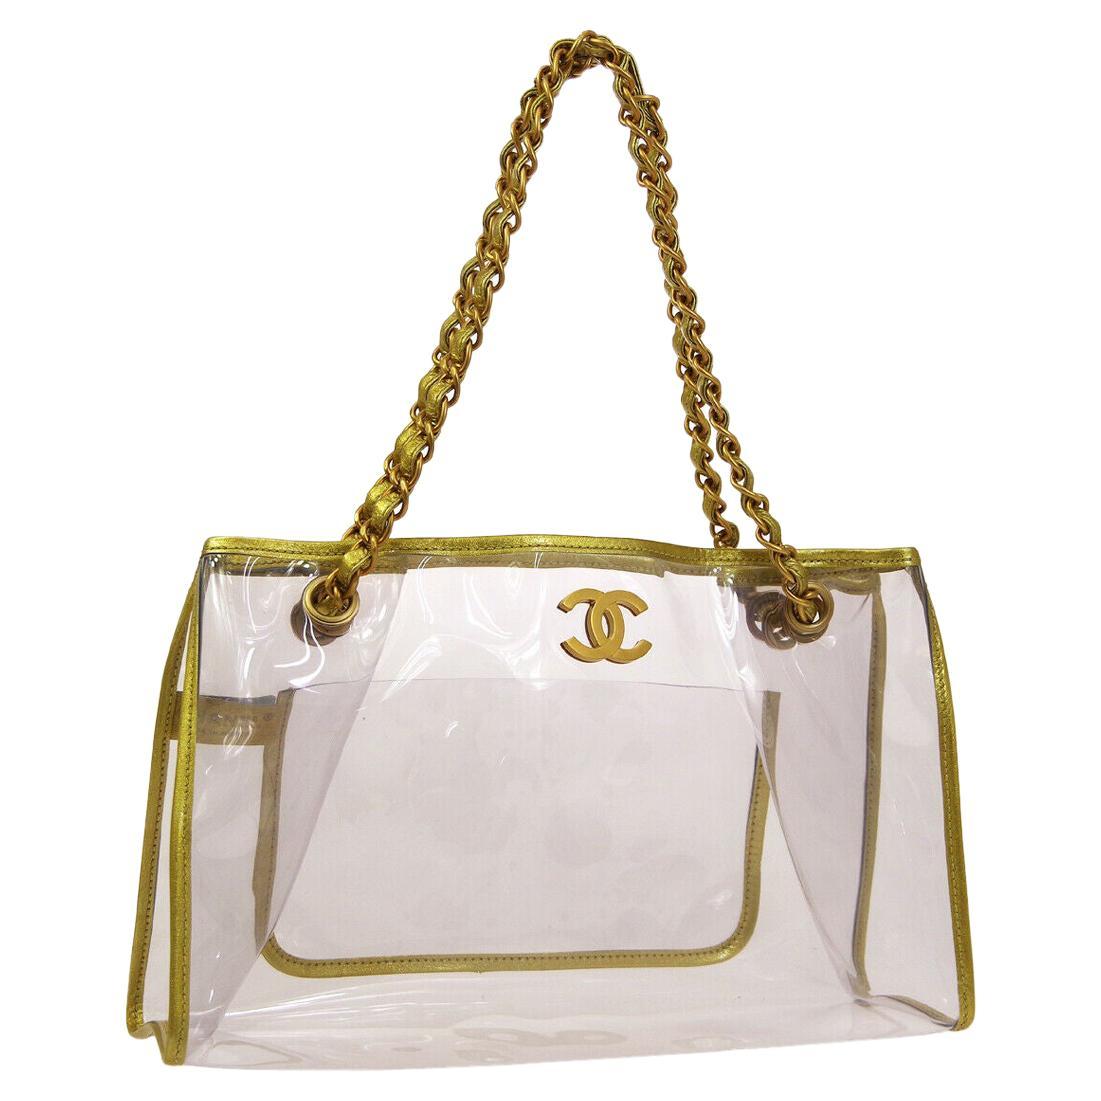 Chanel Clear Gold Leather Trim Large Carryall Shopper Shoulder Tote Bag